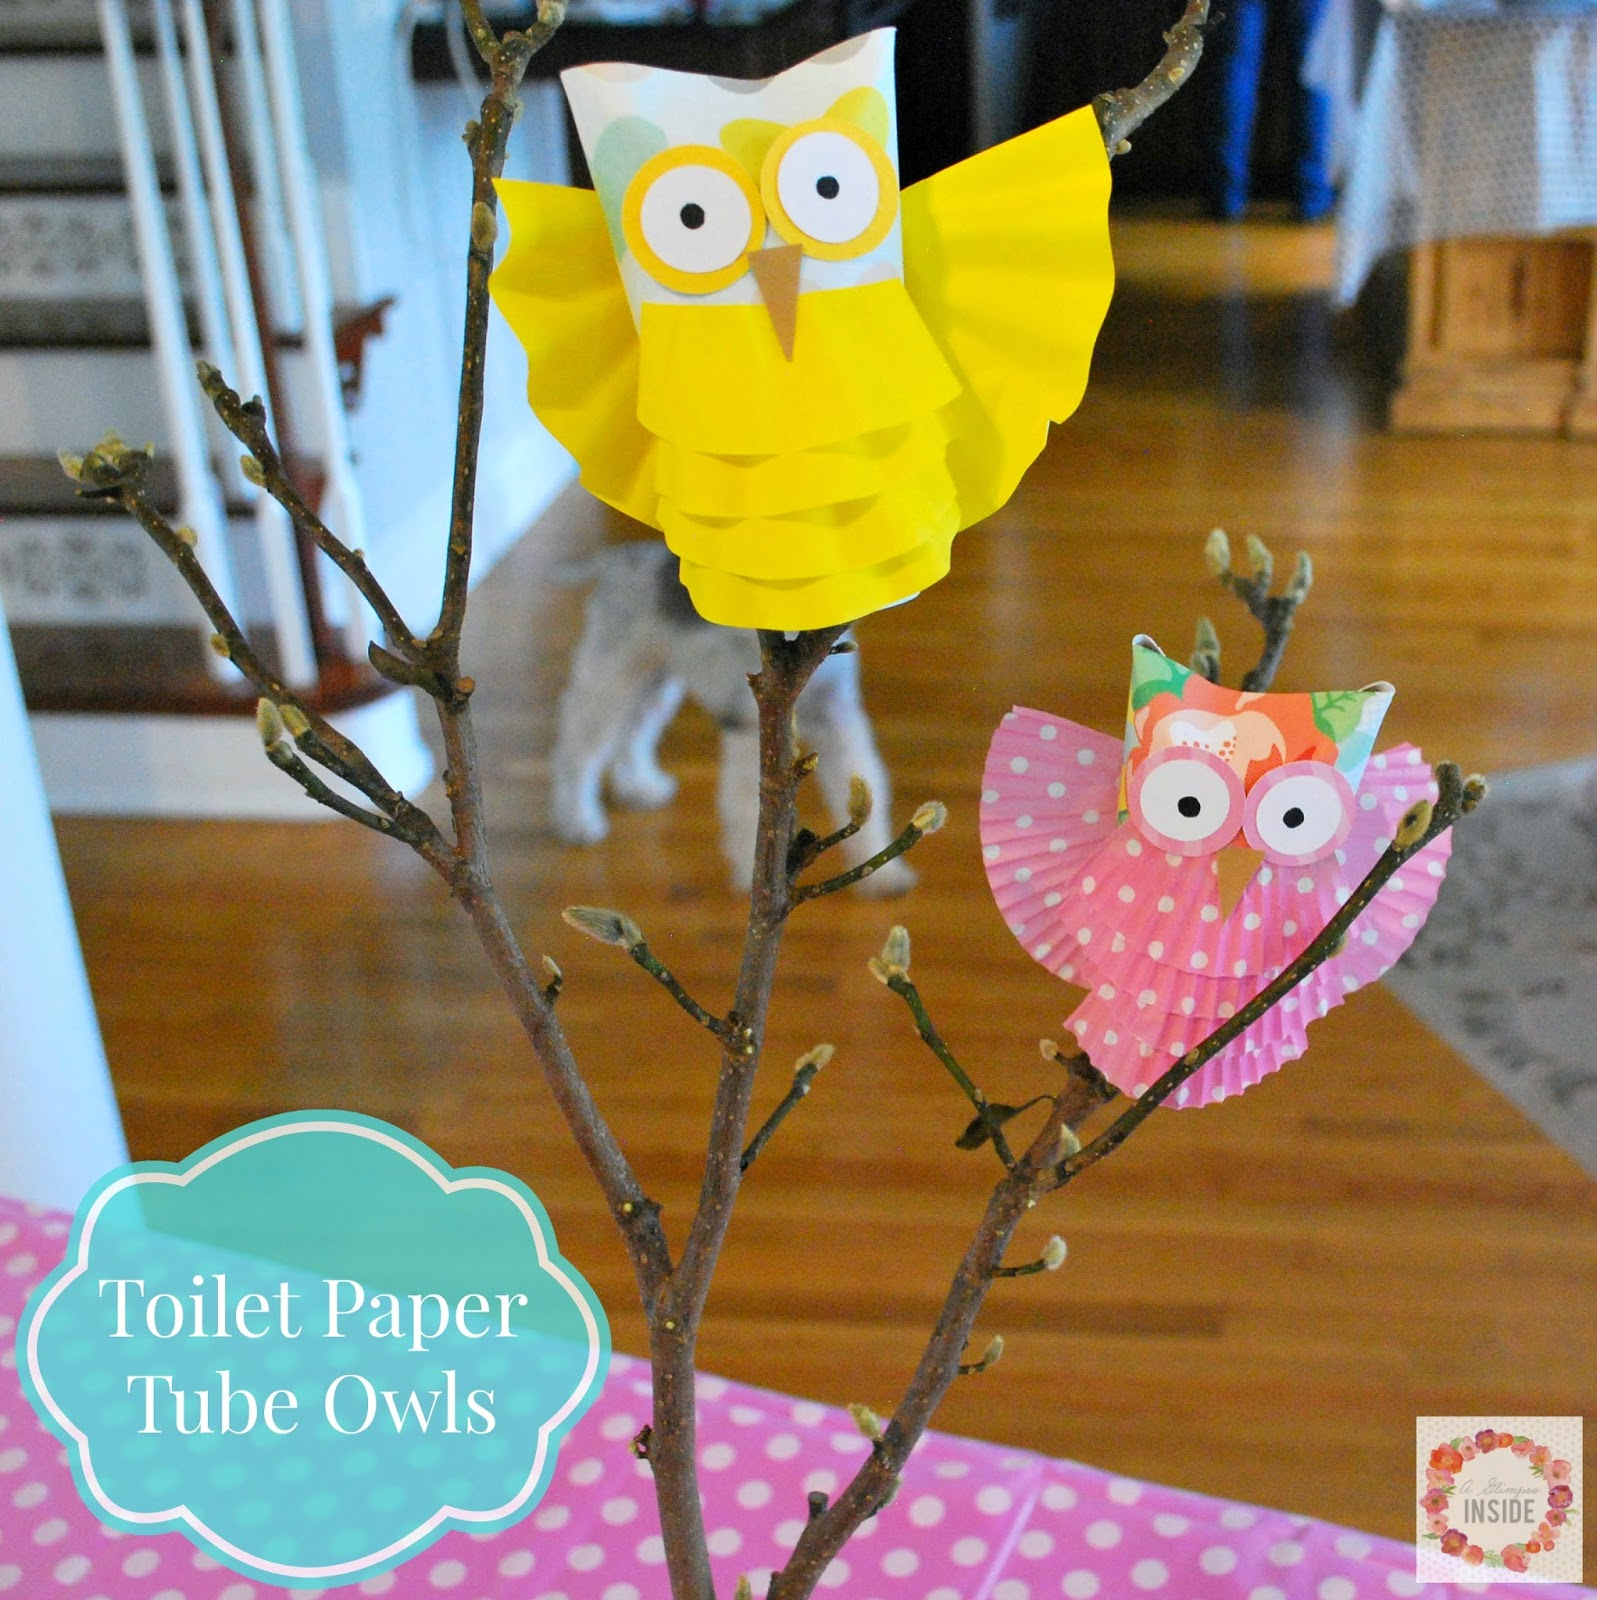 http://www.aglimpseinsideblog.com/2014/12/toilet-paper-tube-owls.html